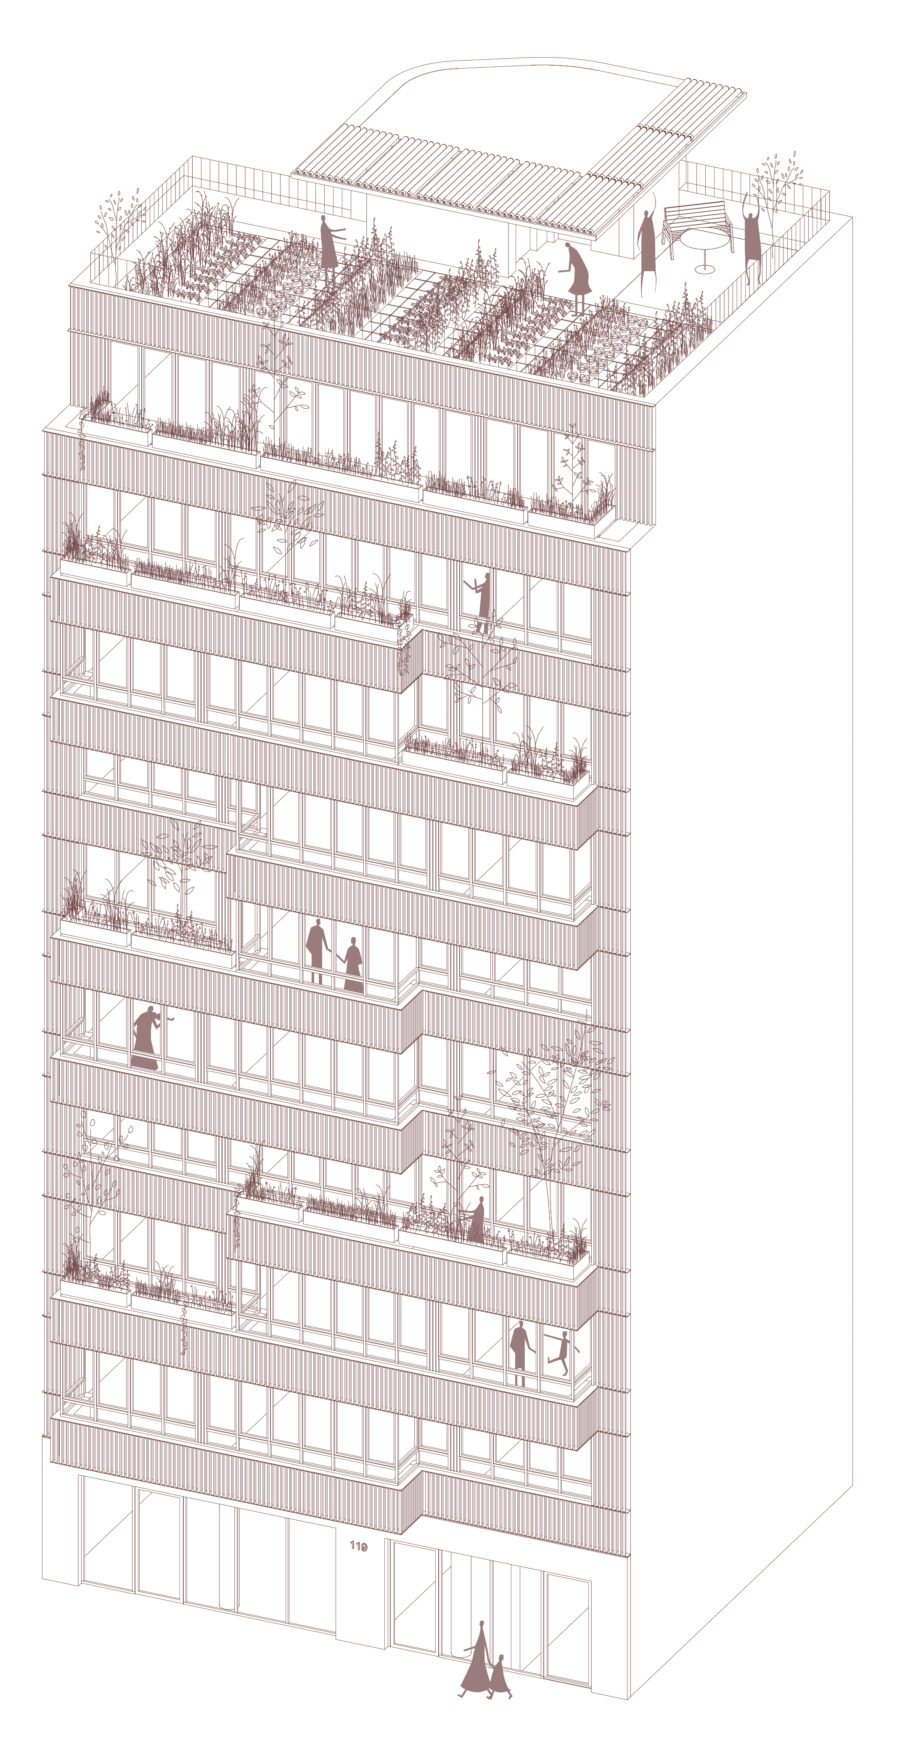 ecallard-16_logements_sociaux-paris_4.jpg